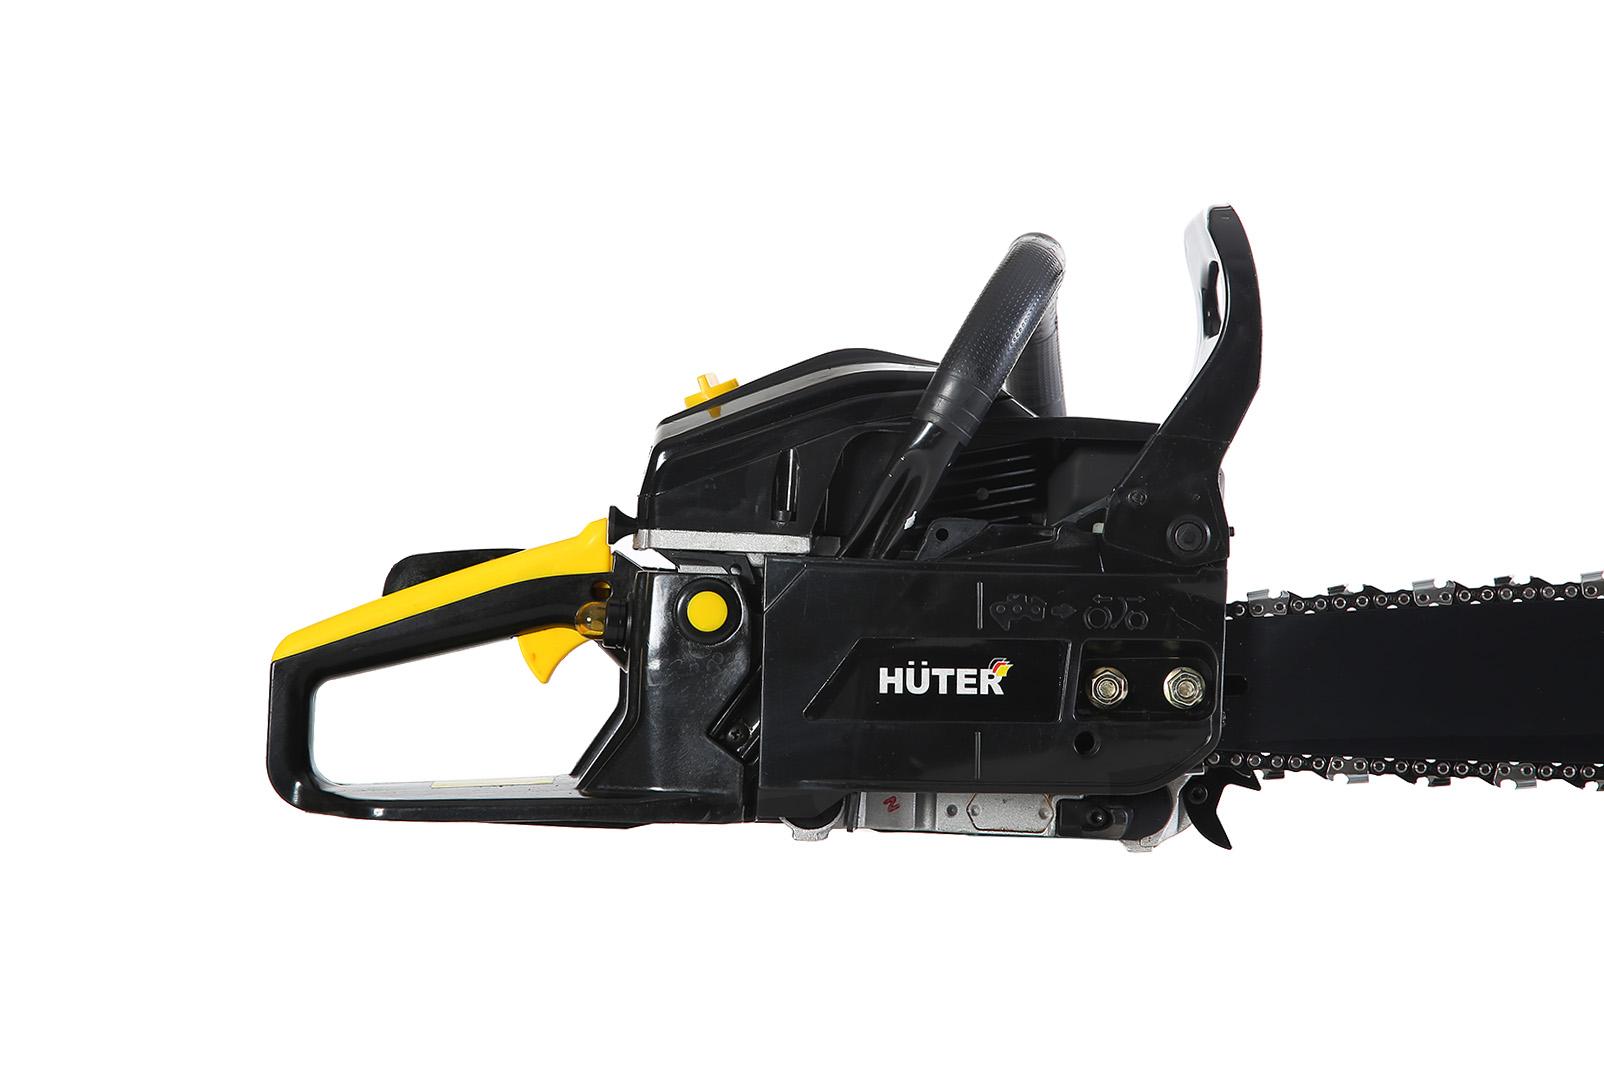 Бензопила huter bs-52. обзор, характеристики, отзывы